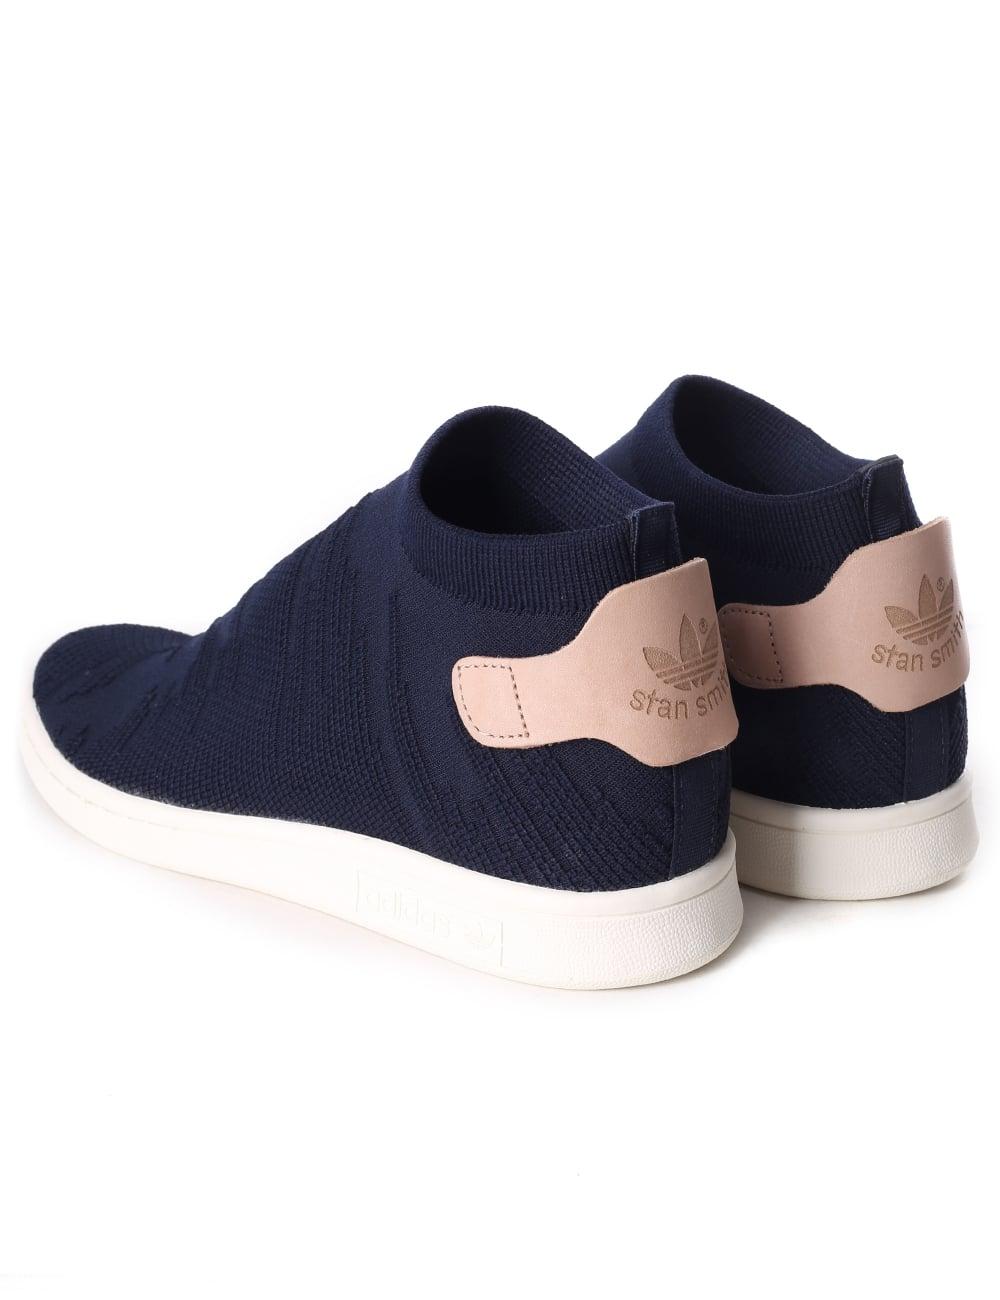 Adidas Sock Stan Shoes Women's Smith Primeknit iXukZP